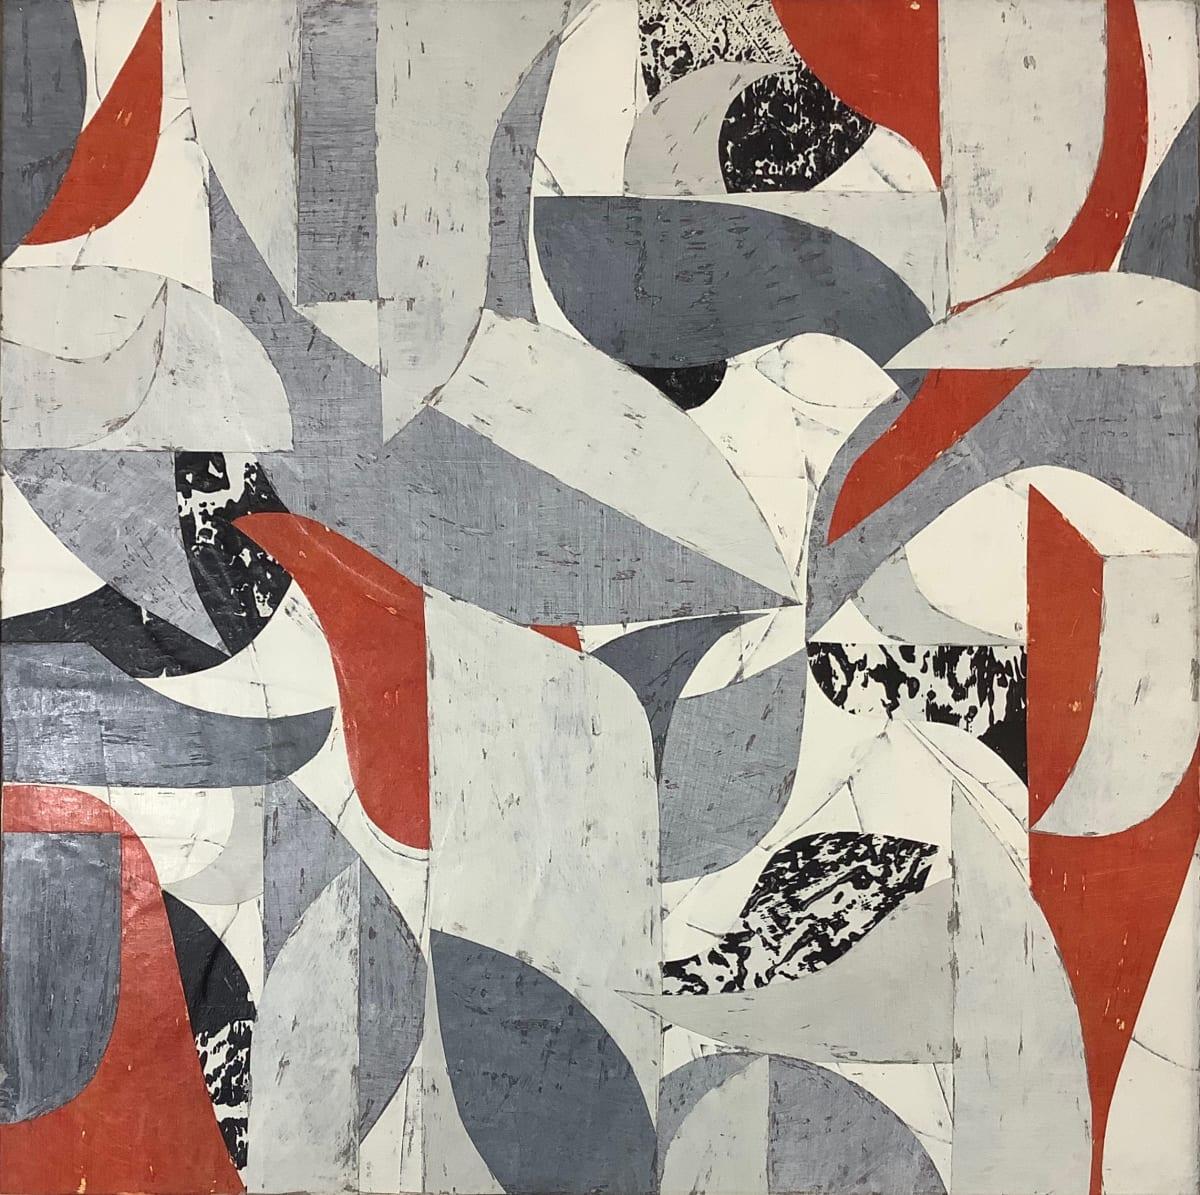 Daniel Anselmi, Untitled (12-14), 2019